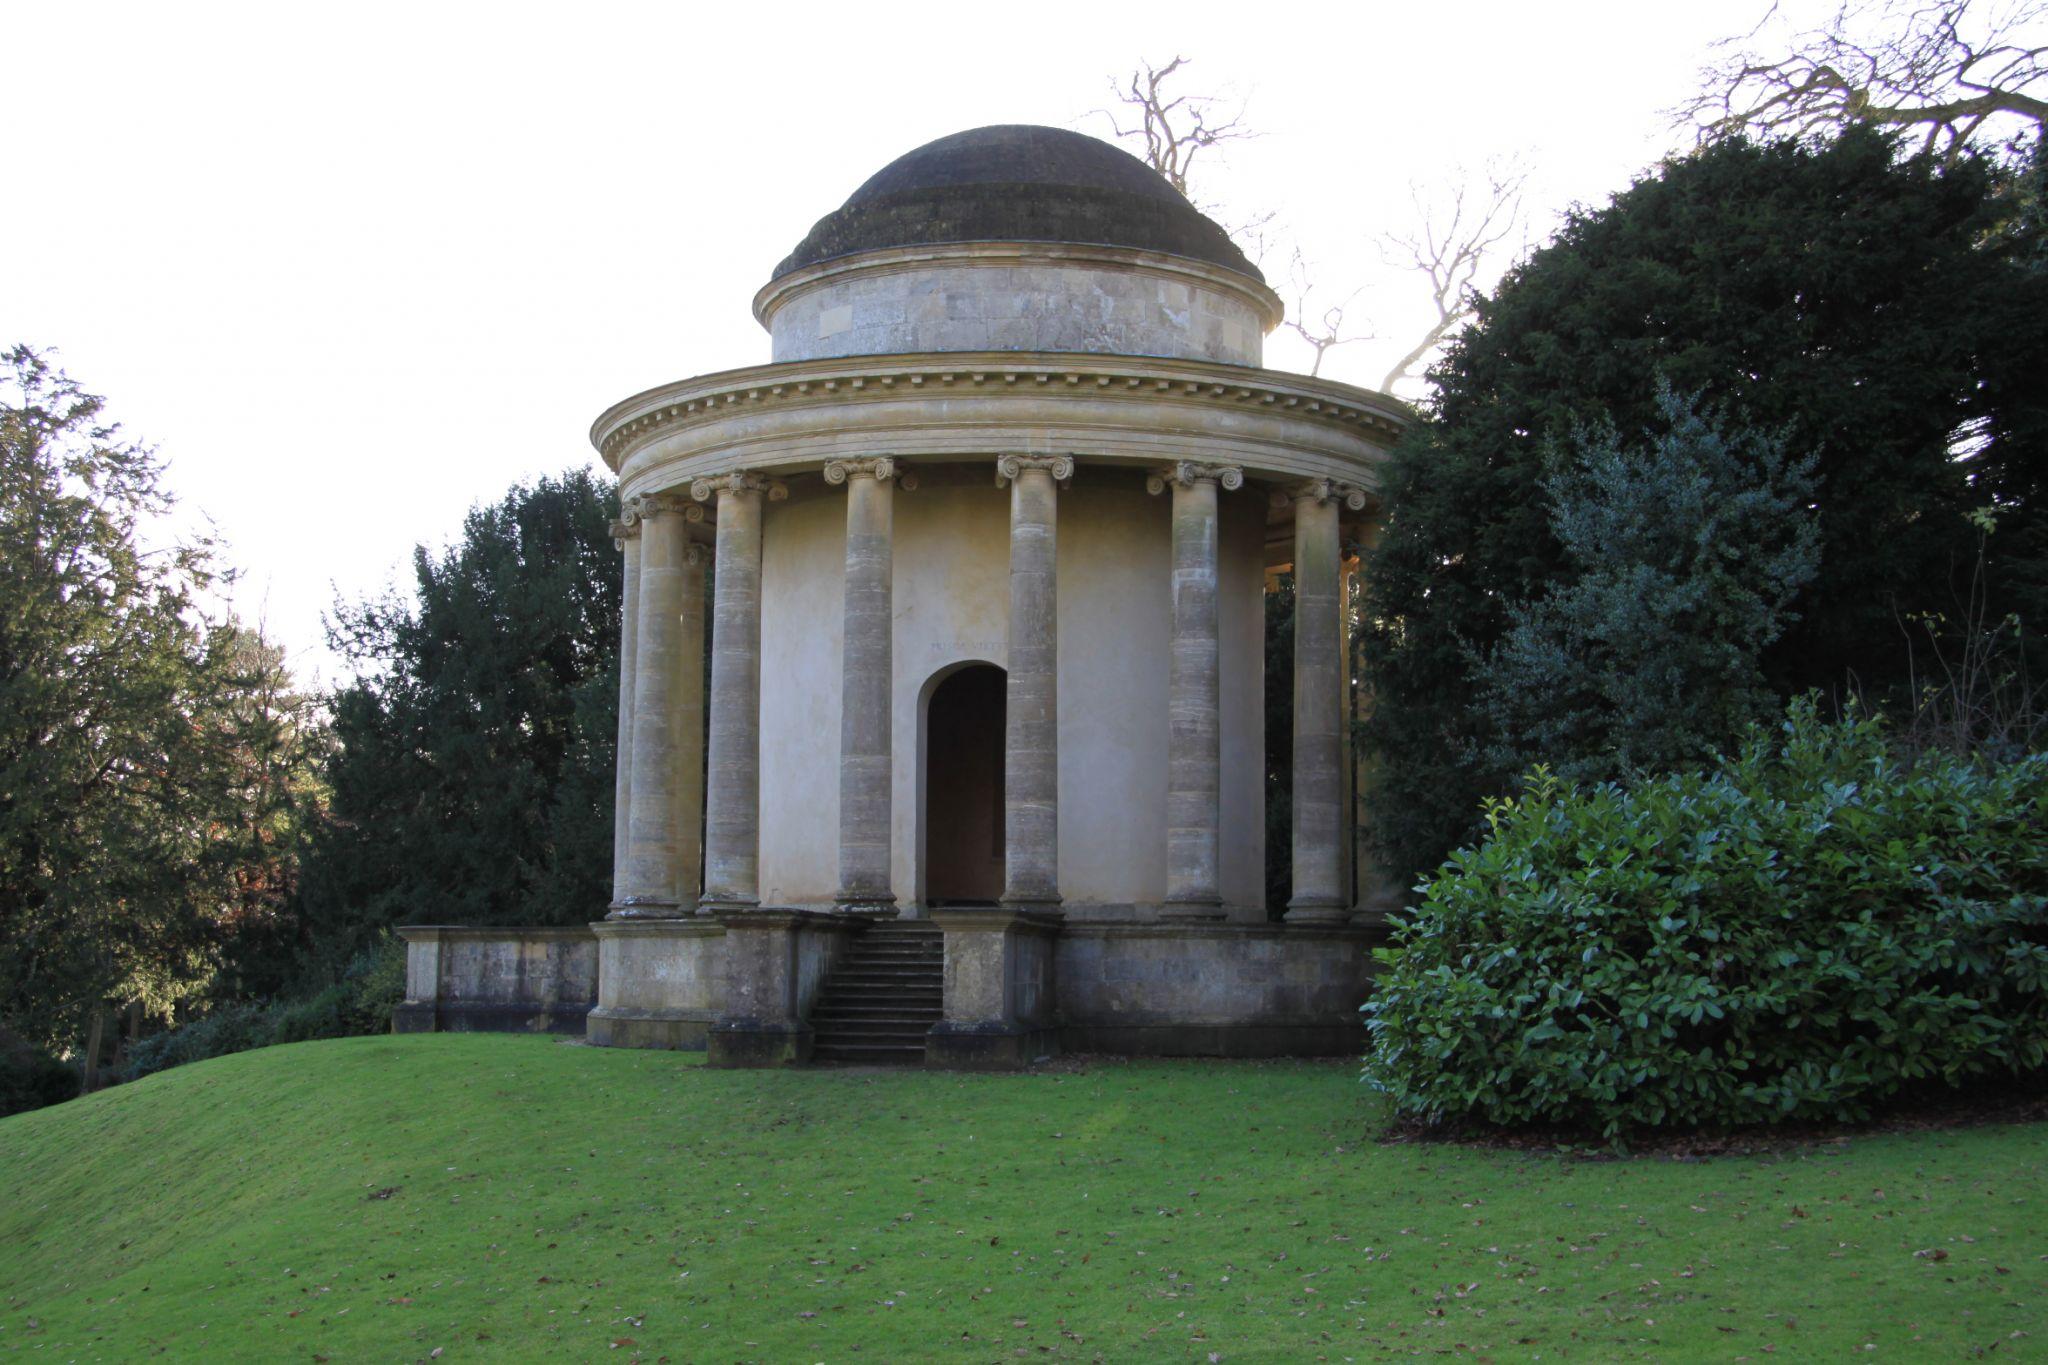 Stowe - Temple of Ancient Virtue, United Kingdom